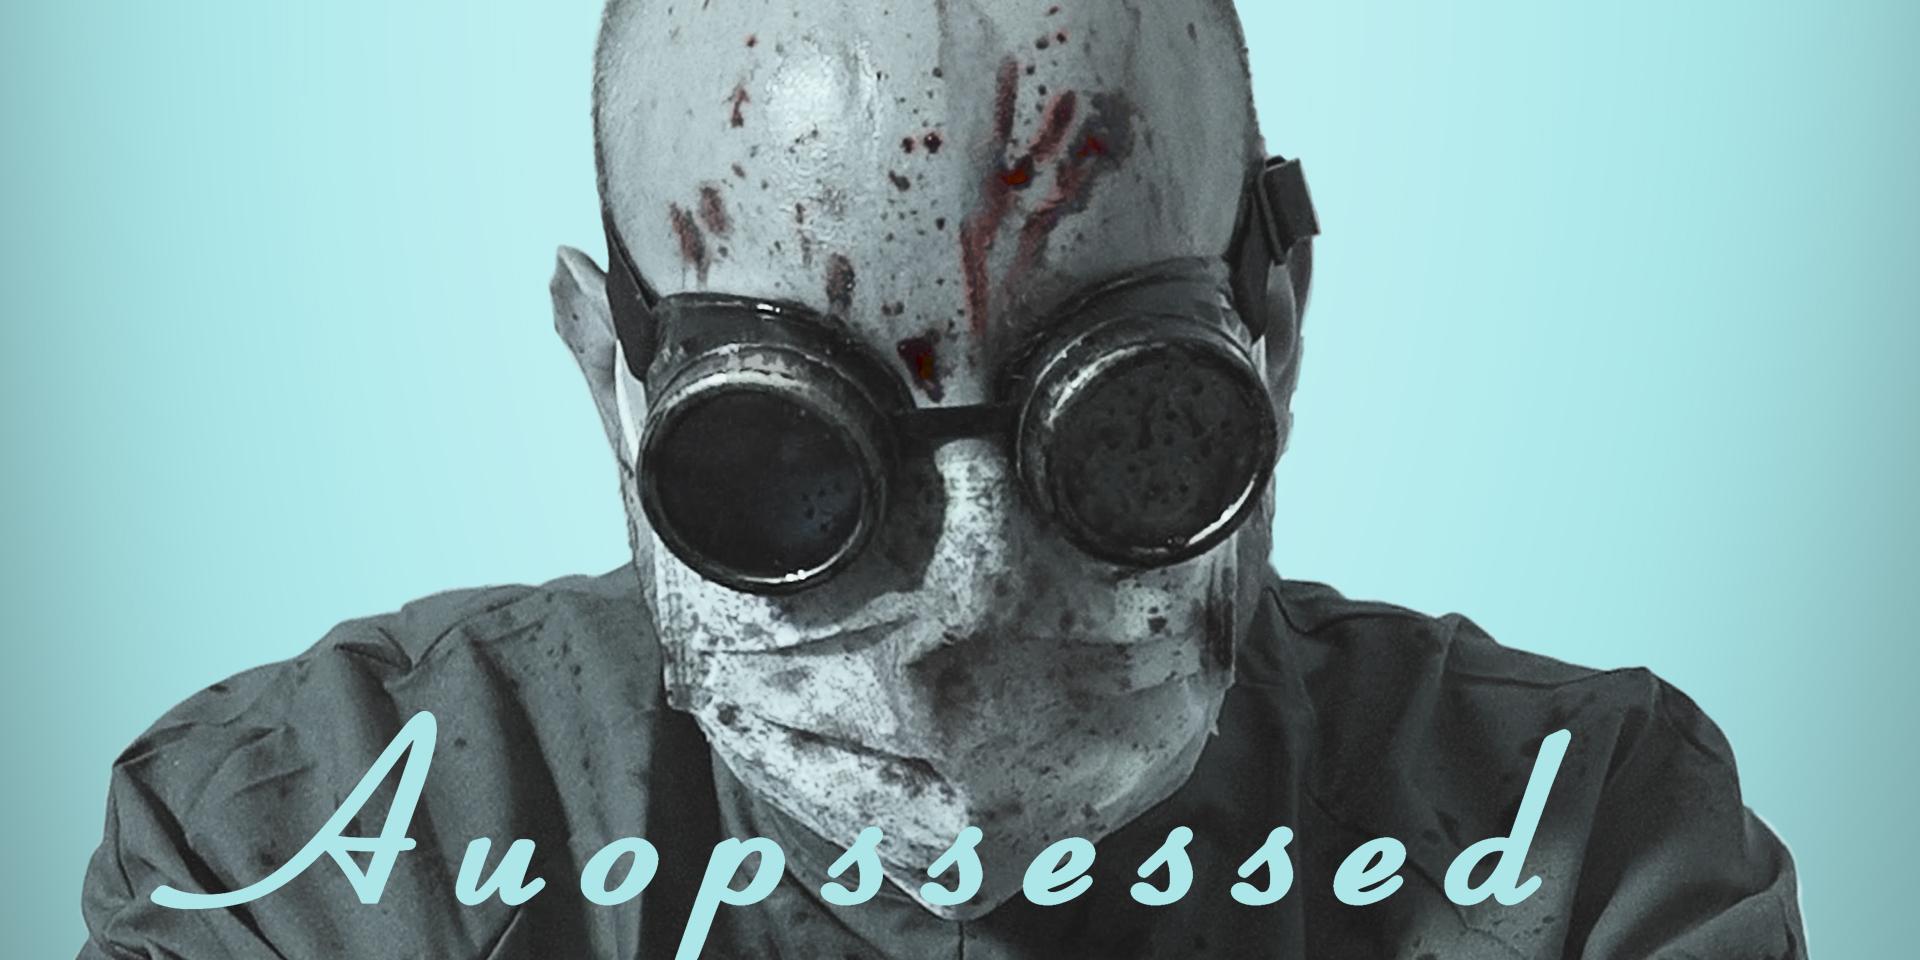 Auop 2x1 - Chunks of Horror Season 2